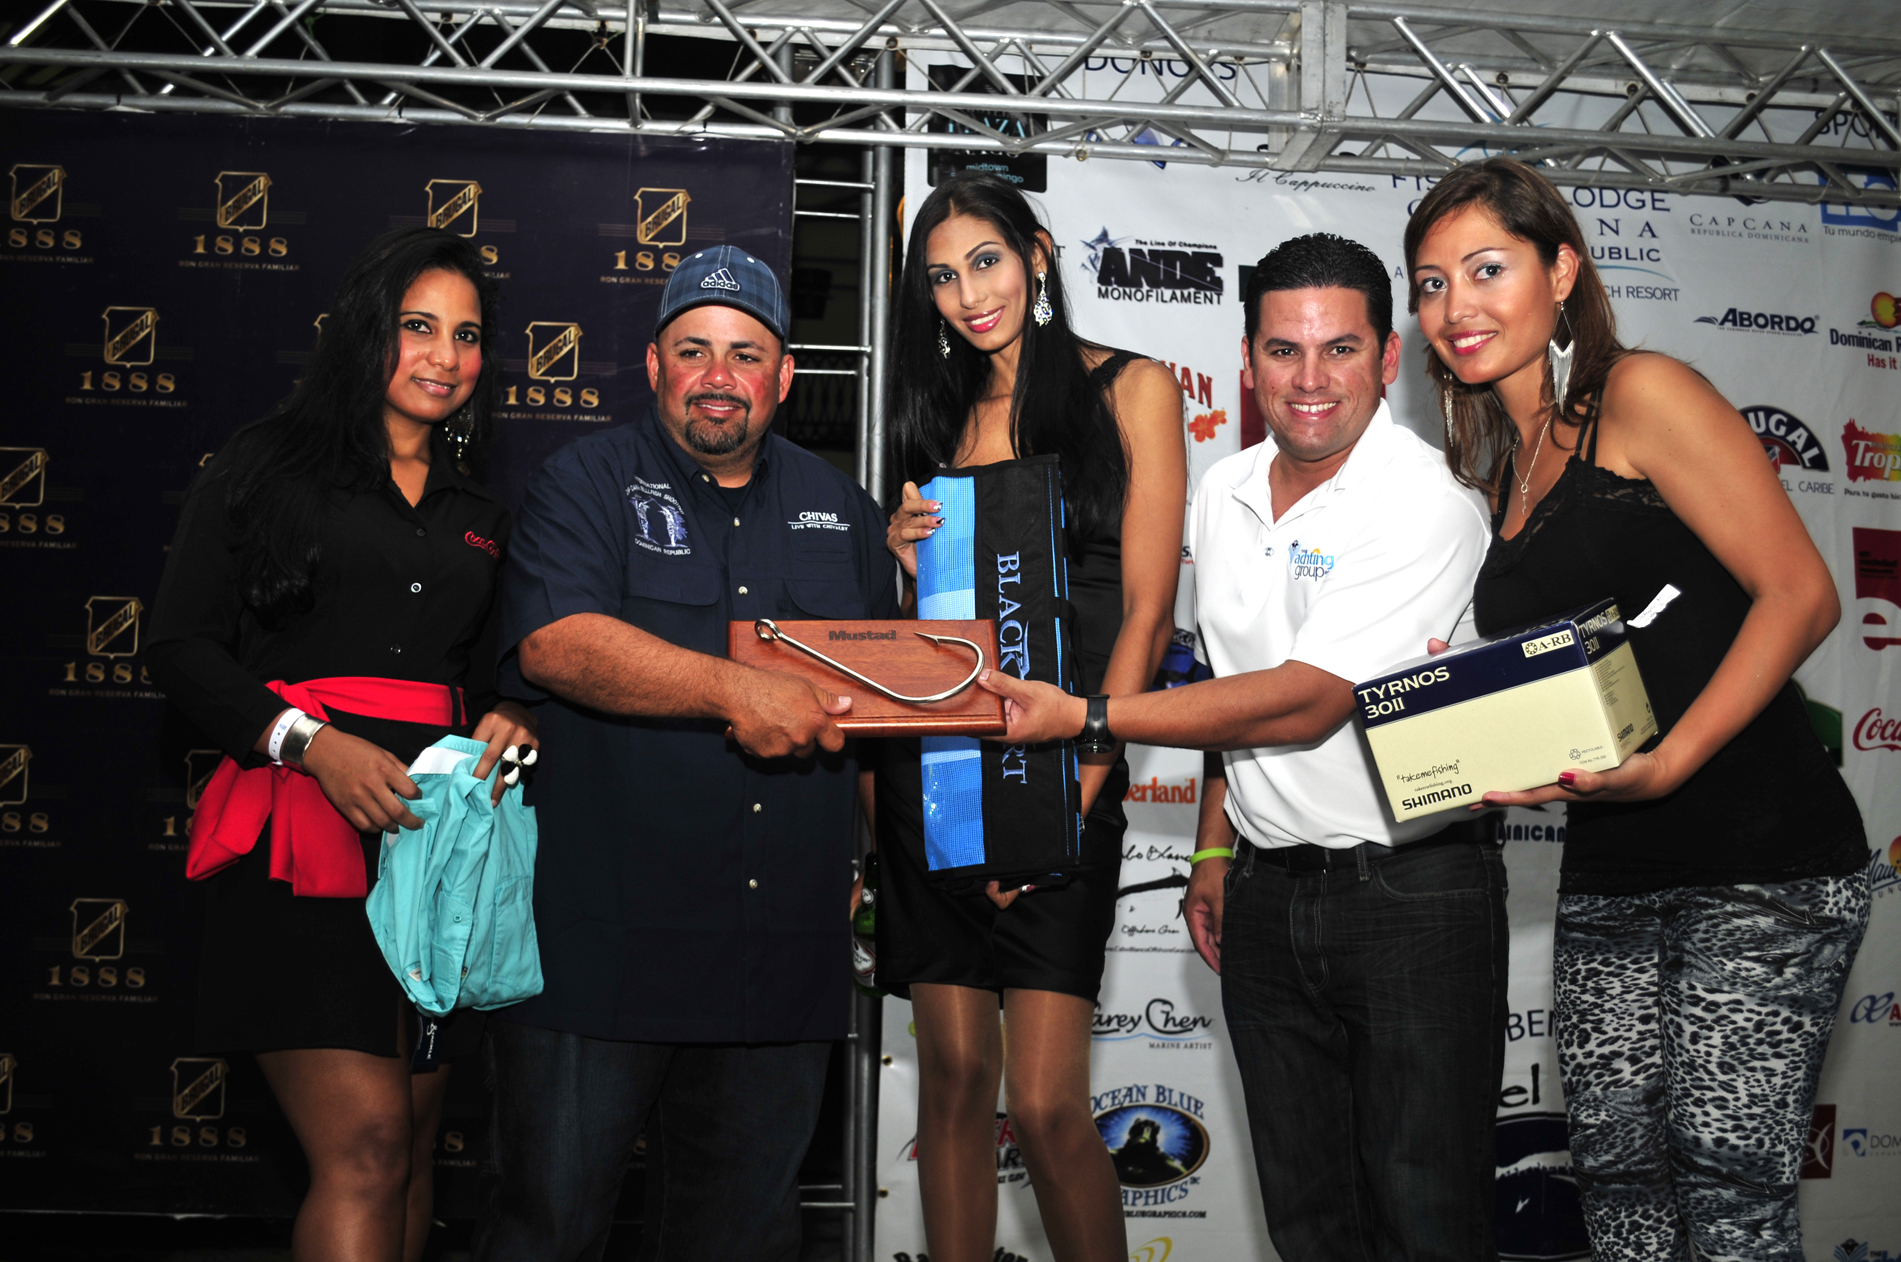 La Lancha Shak Byte dominó torneo de pesca